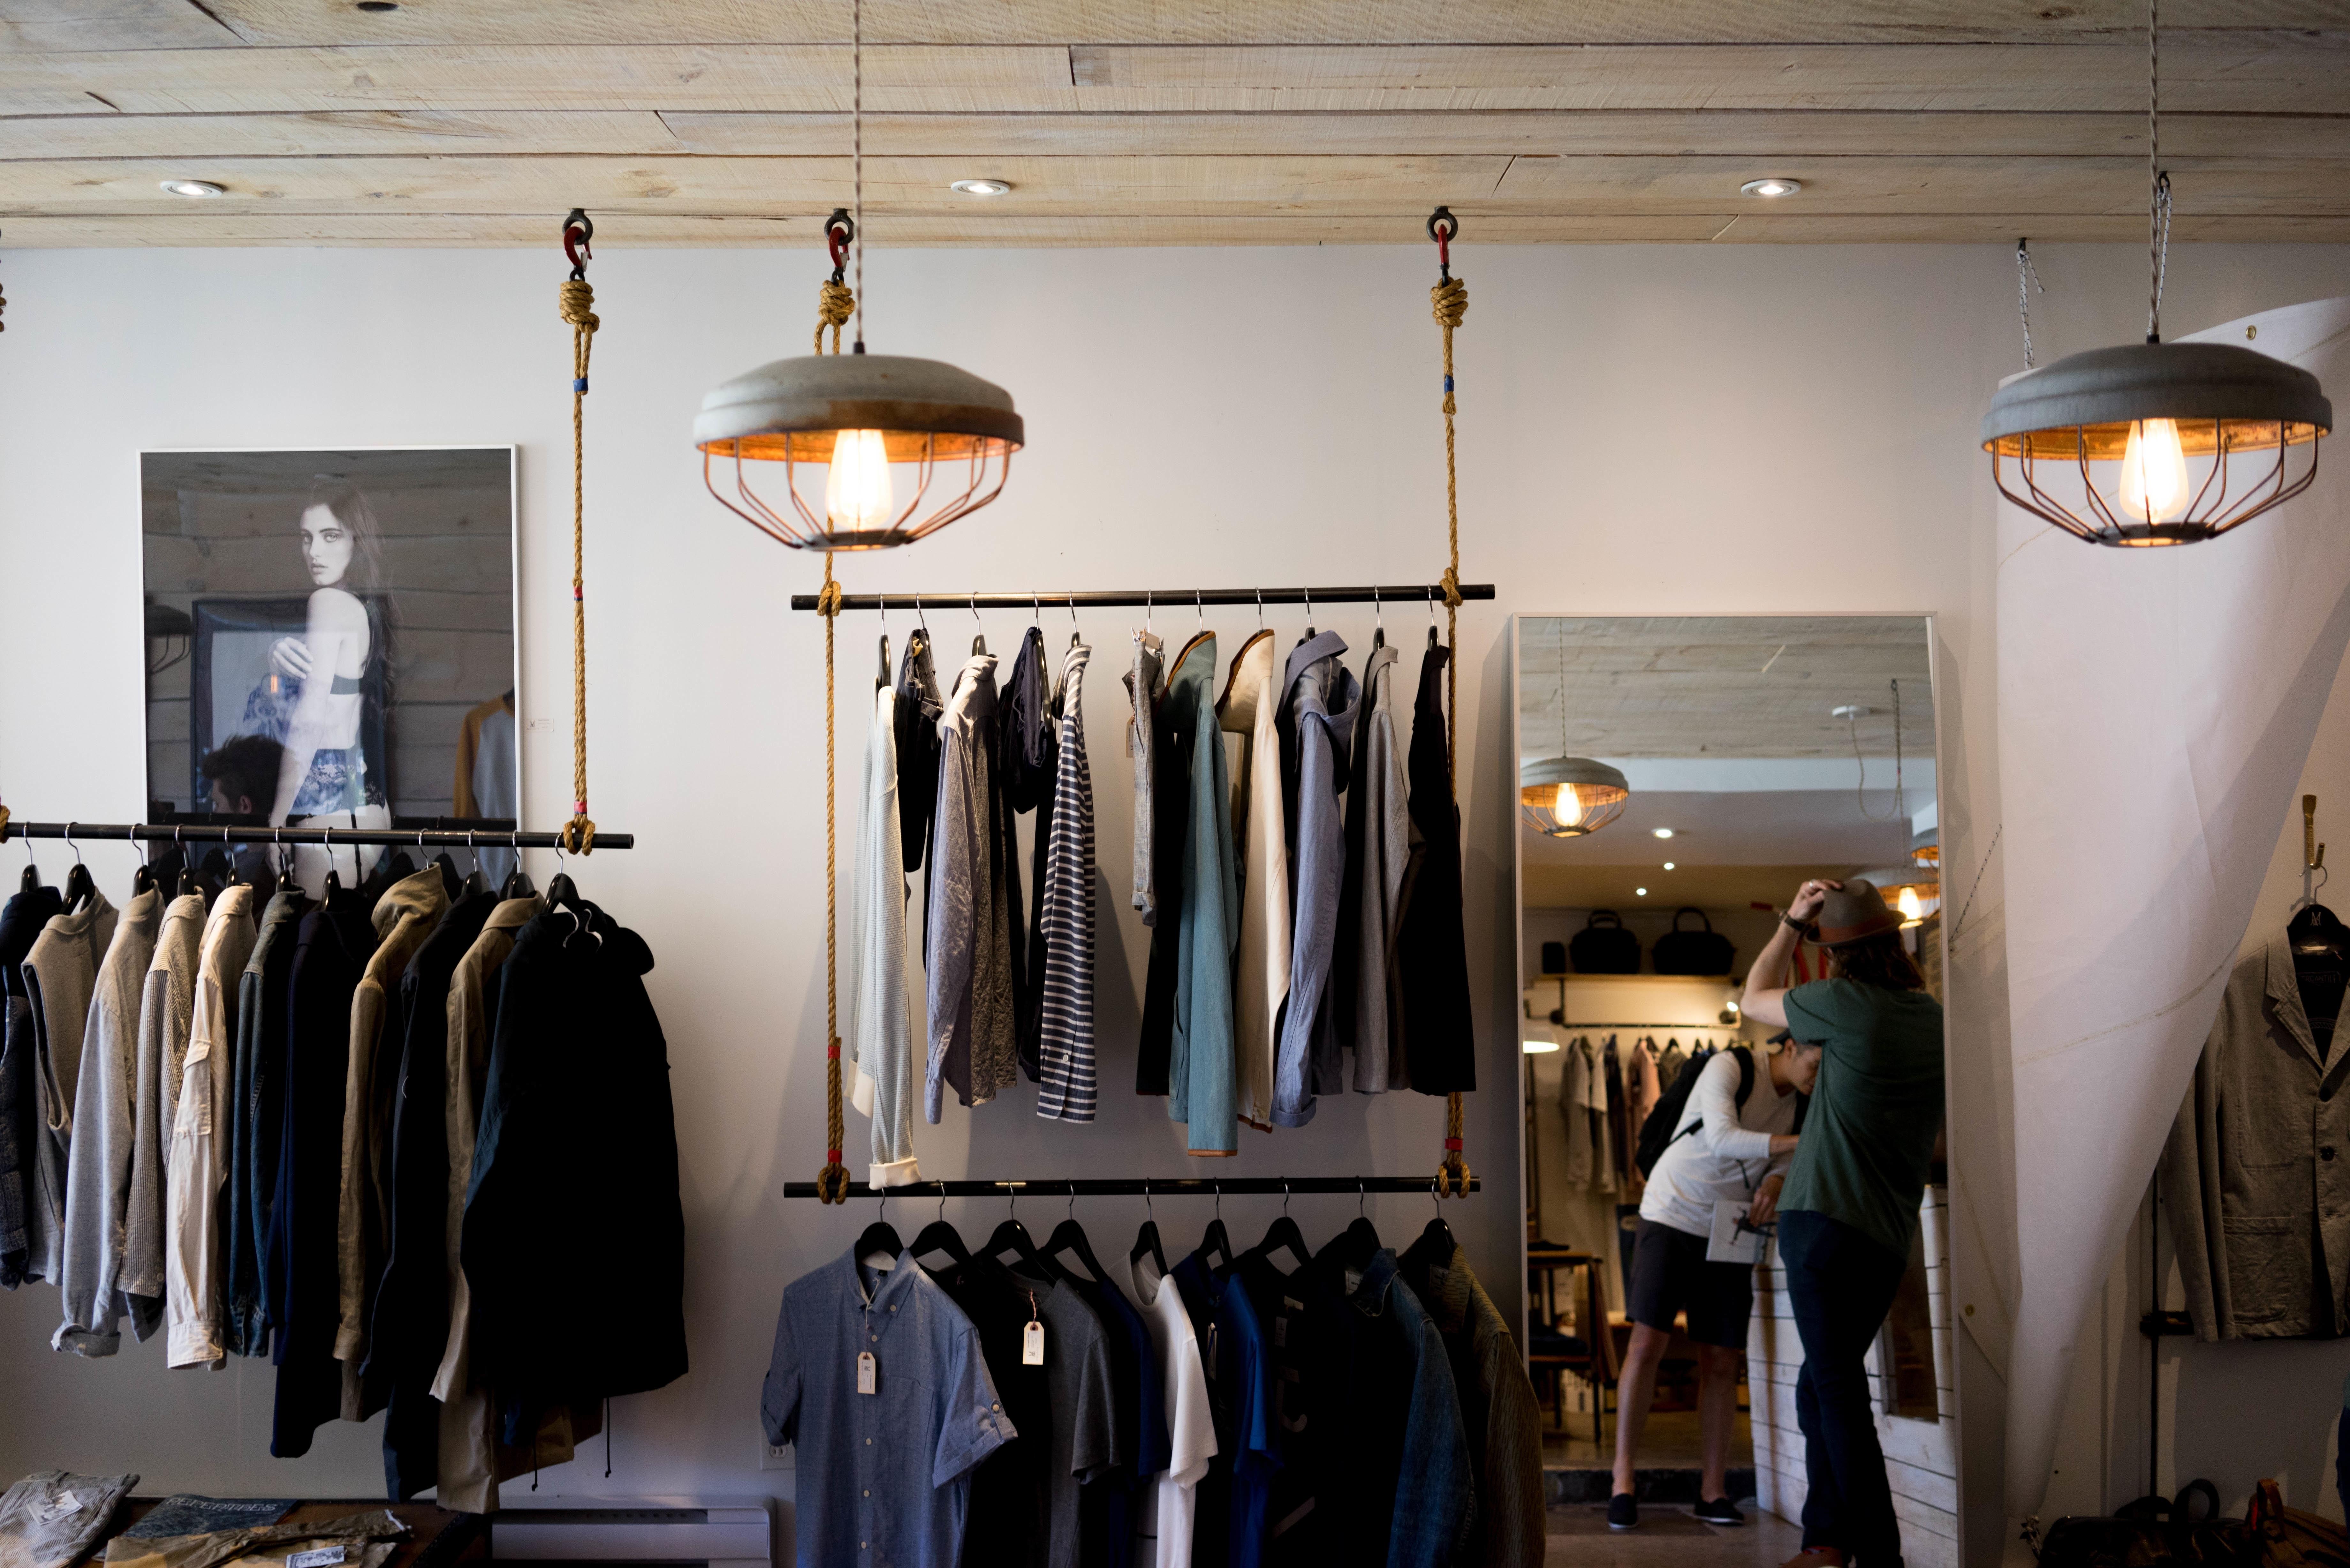 Home Shop Business Shopping Room Lighting Garment Interior Design Clothing  Store Boutique Design Mirror Wardrobe Sale